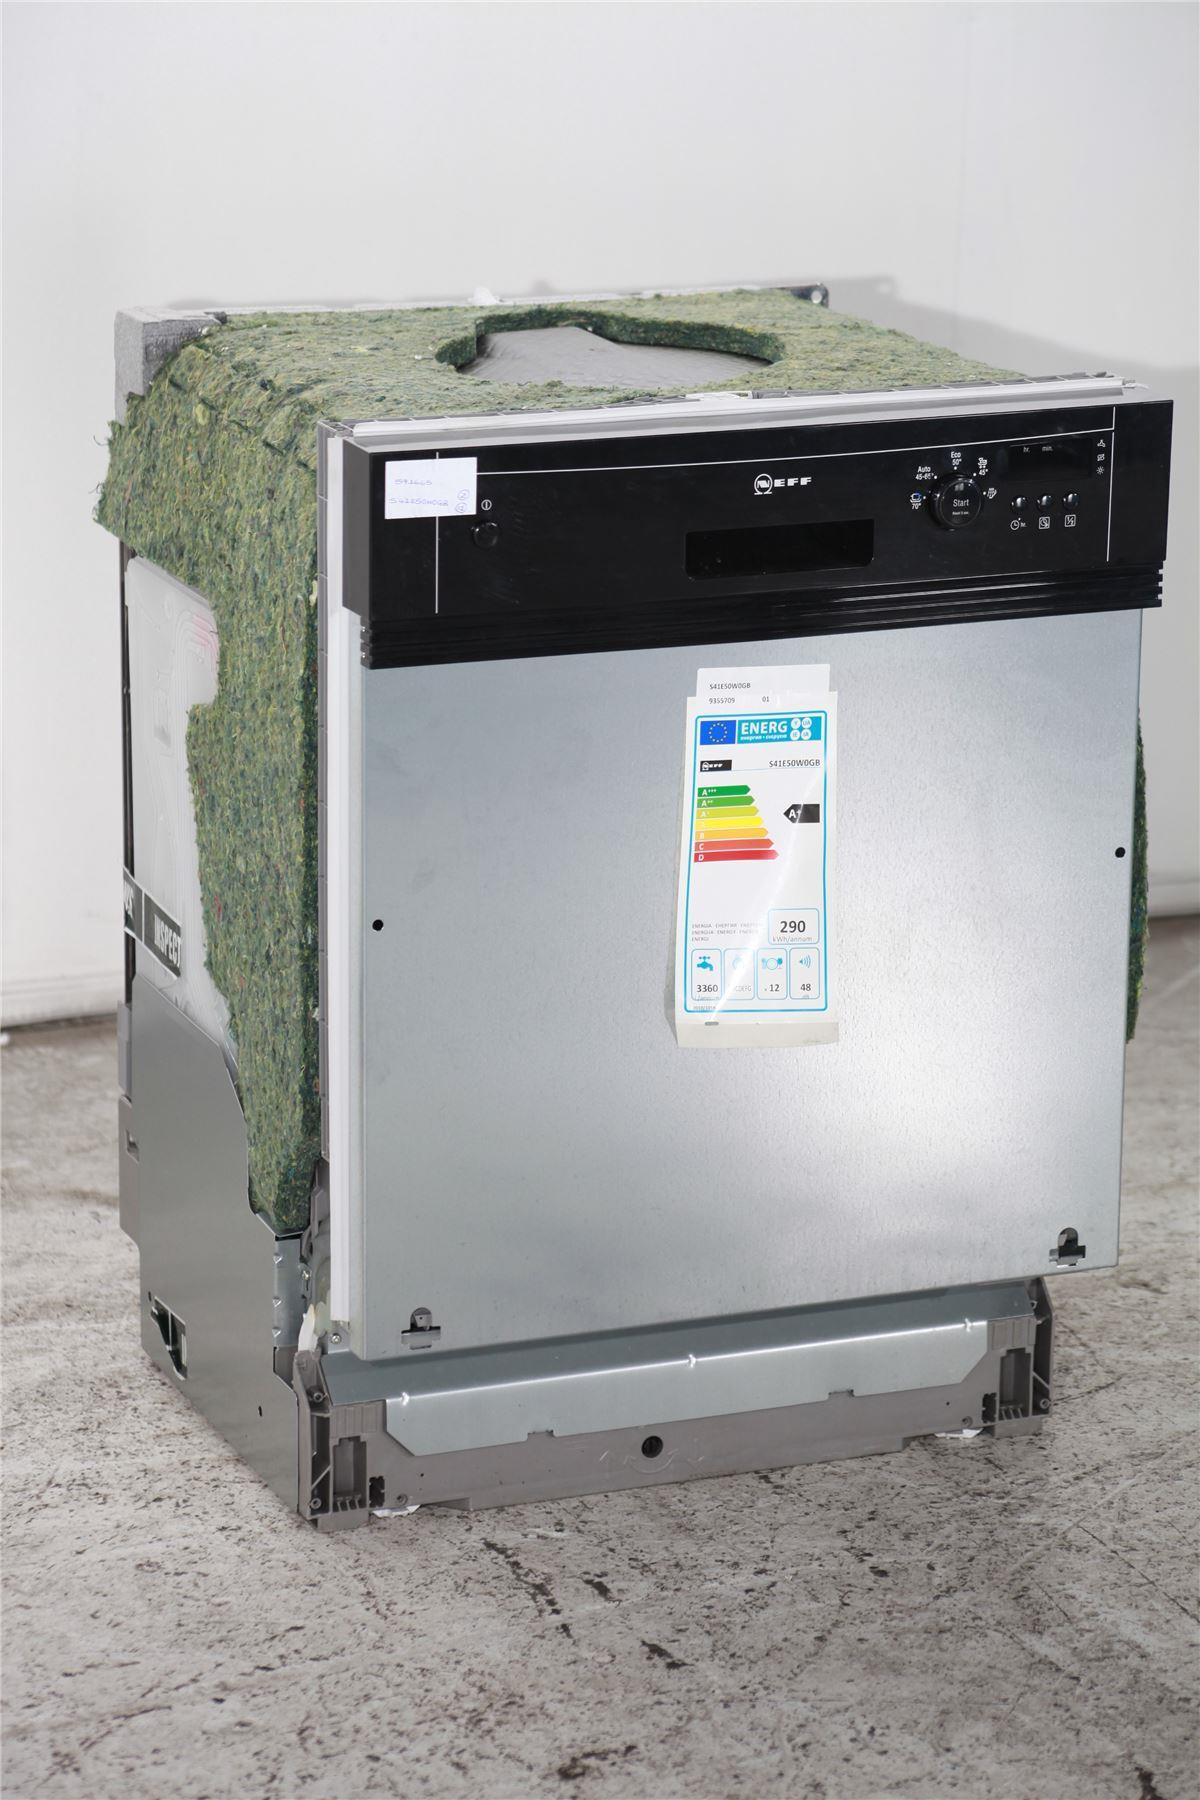 Neff Countertop Microwave : Neff Integrated Dishwasher - S41E50W0GB - Black & Silver Online ...